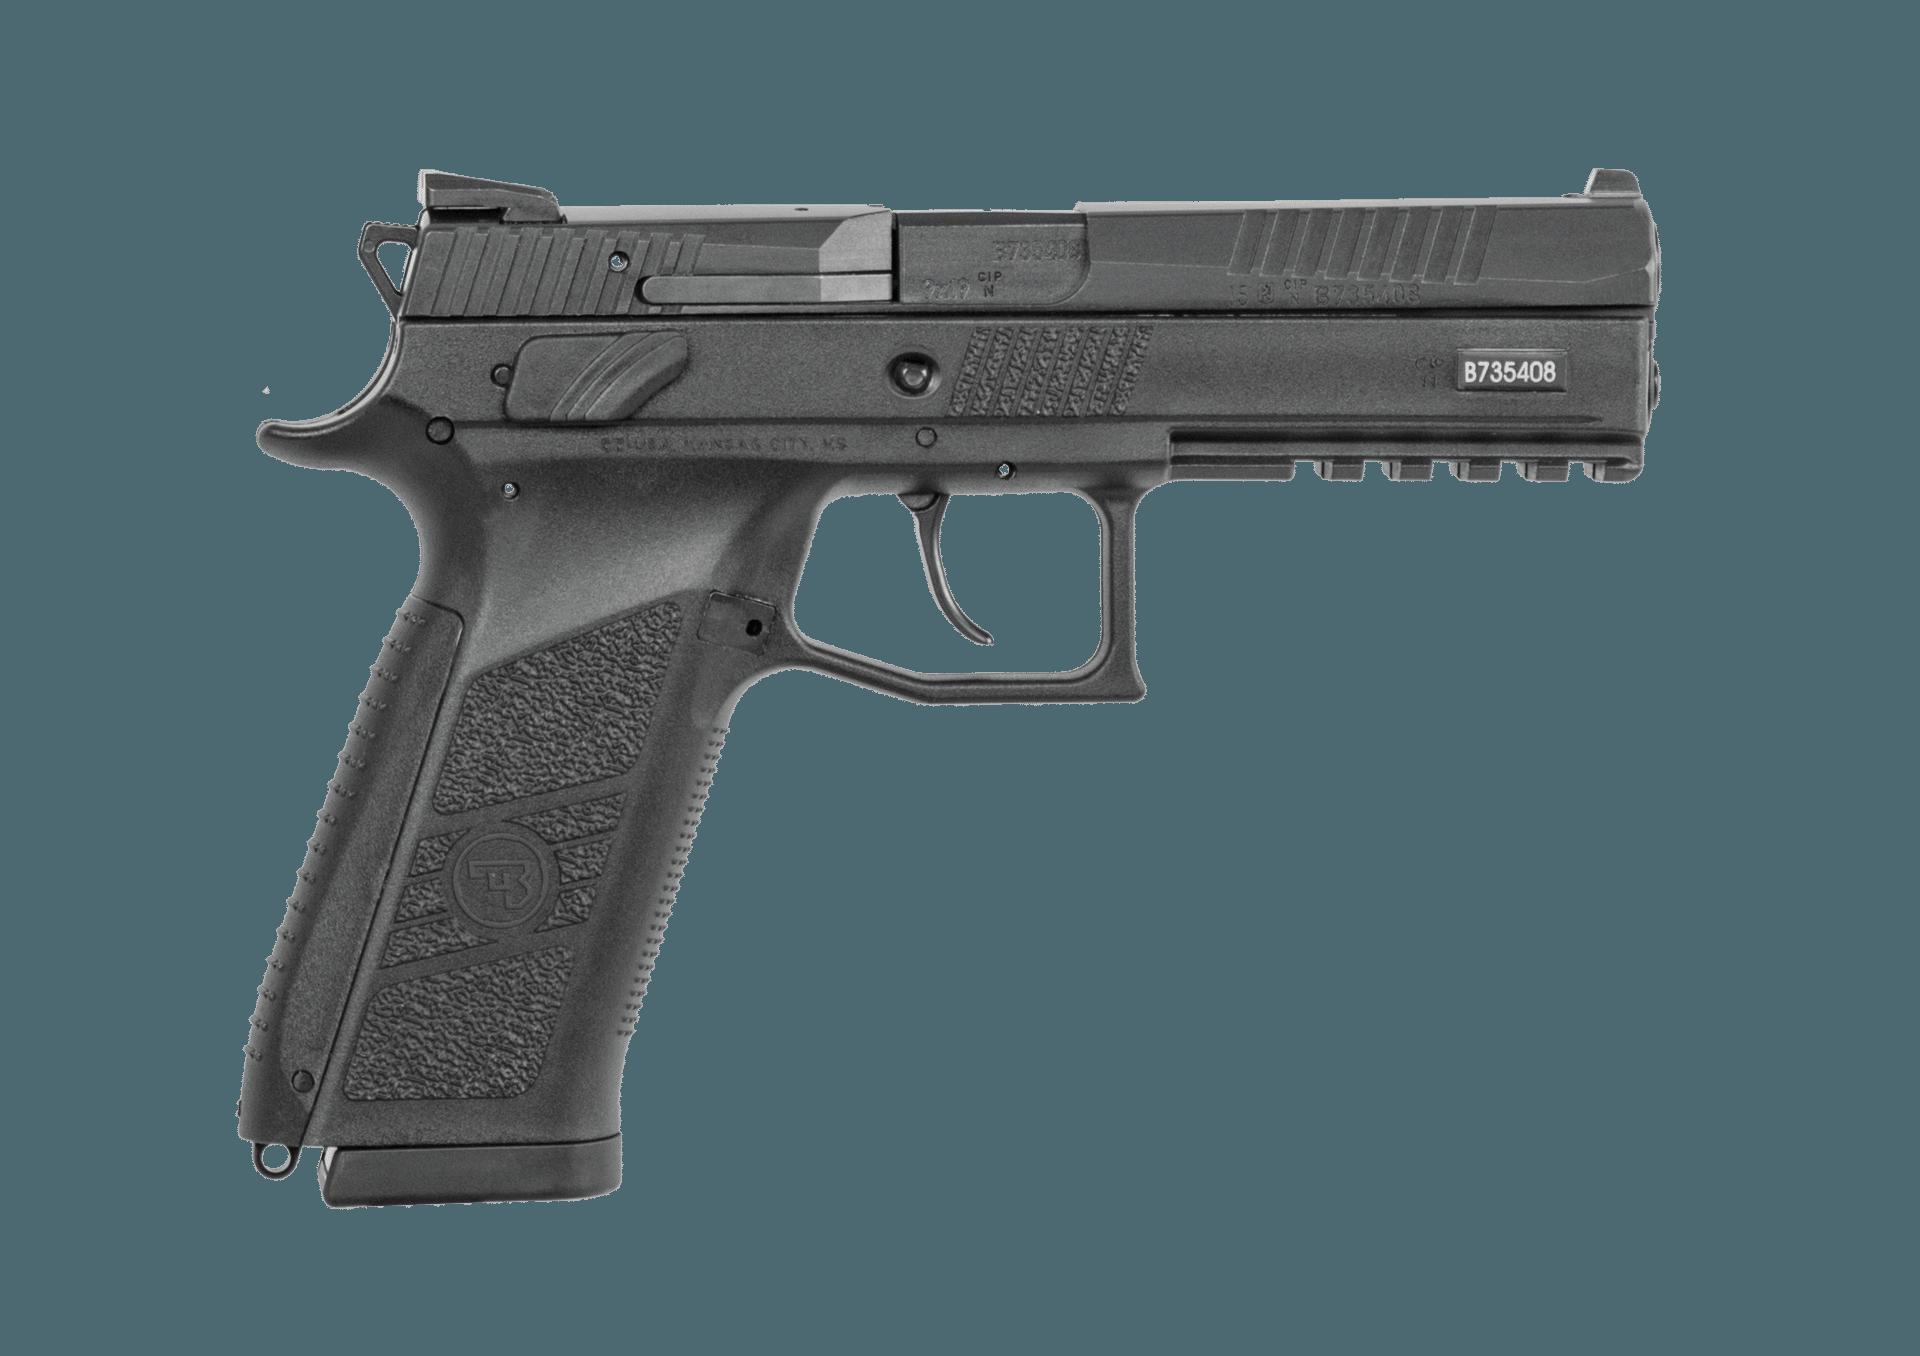 clip royalty free library Gun Firearm Pistol Shooting Range